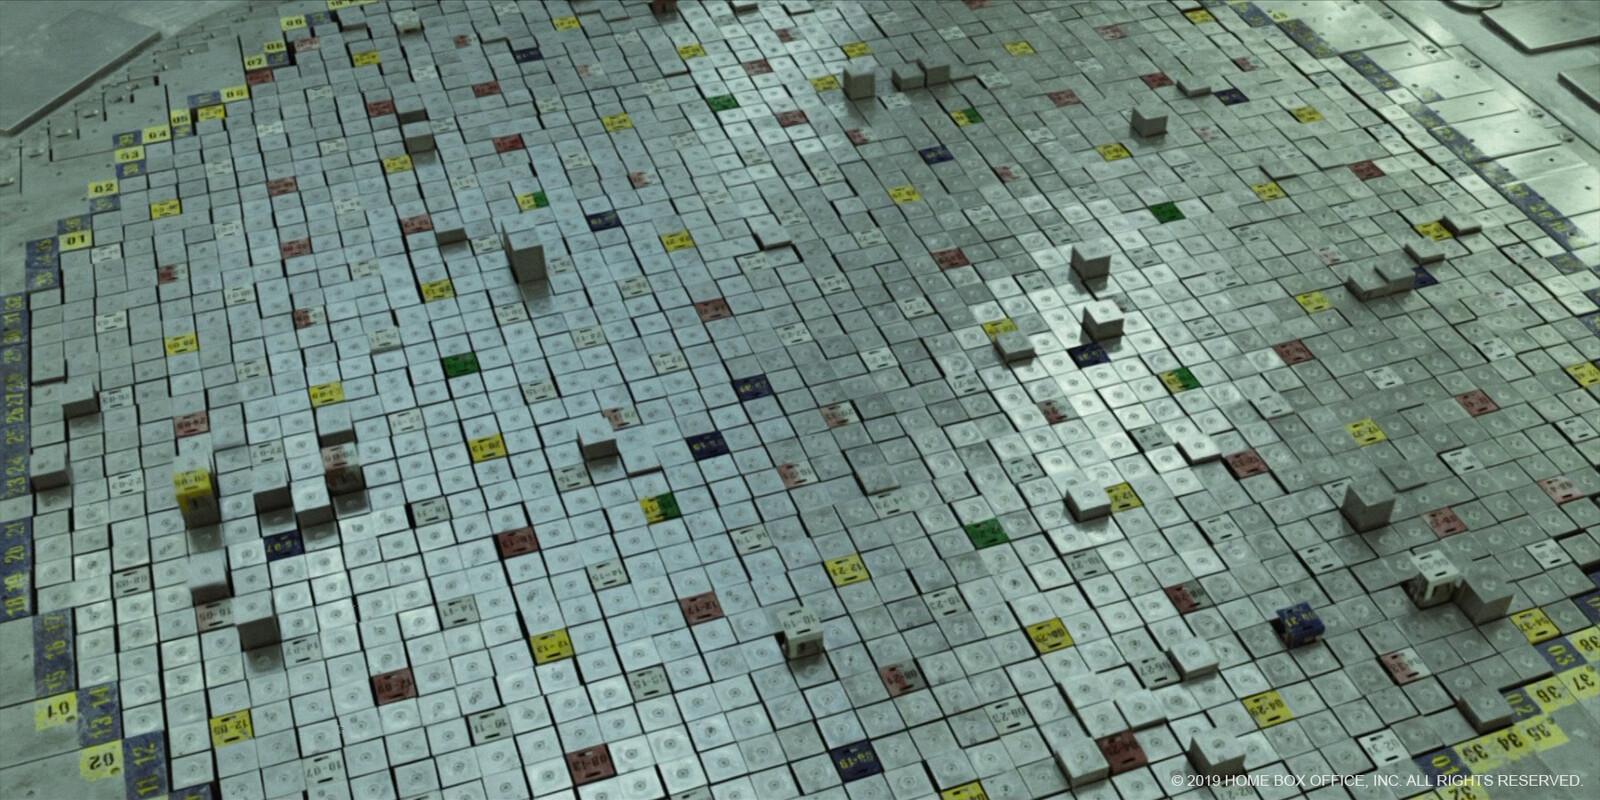 Reactor lid - secondary texturing, lookdev, shot lighting